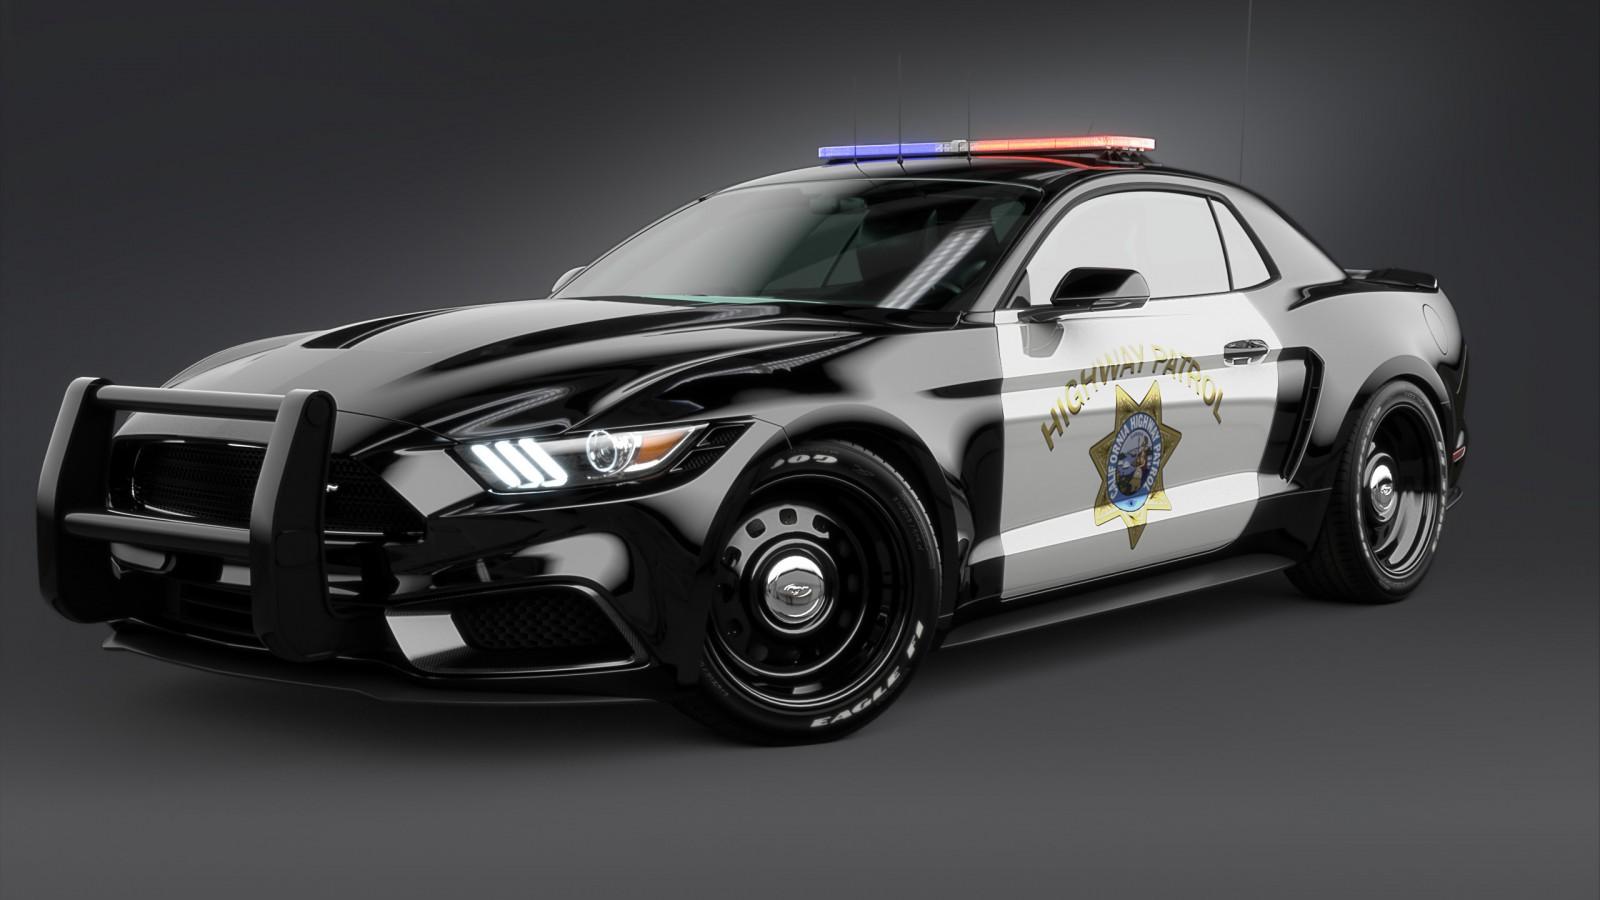 2017 Ford Mustang Notchback Design Police 2 Wallpaper  Hd